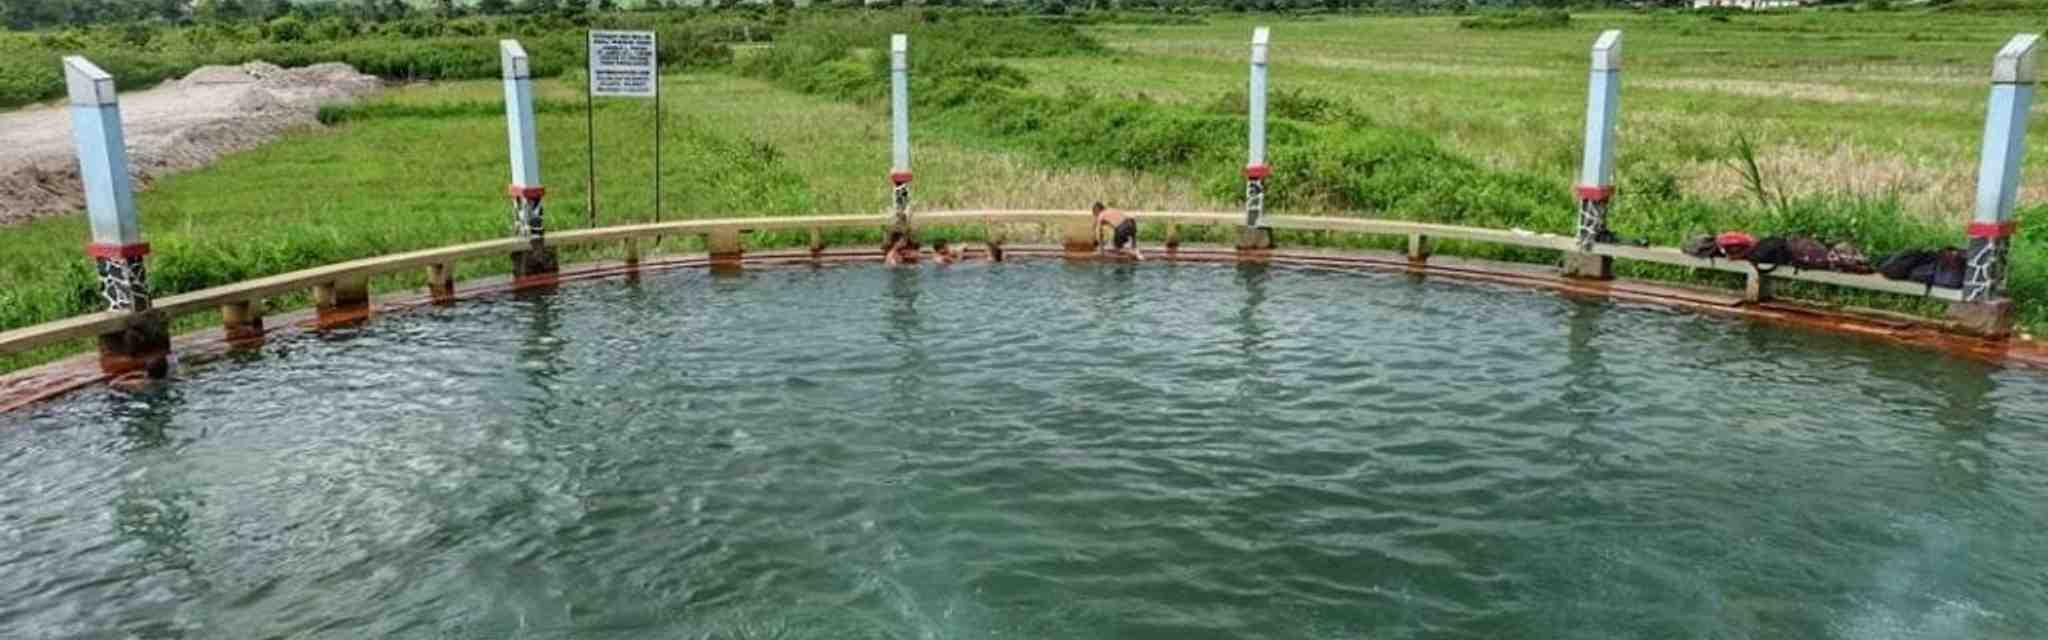 Pemandian Air Soda yang Langka Ini ada di Sumatera Utara!